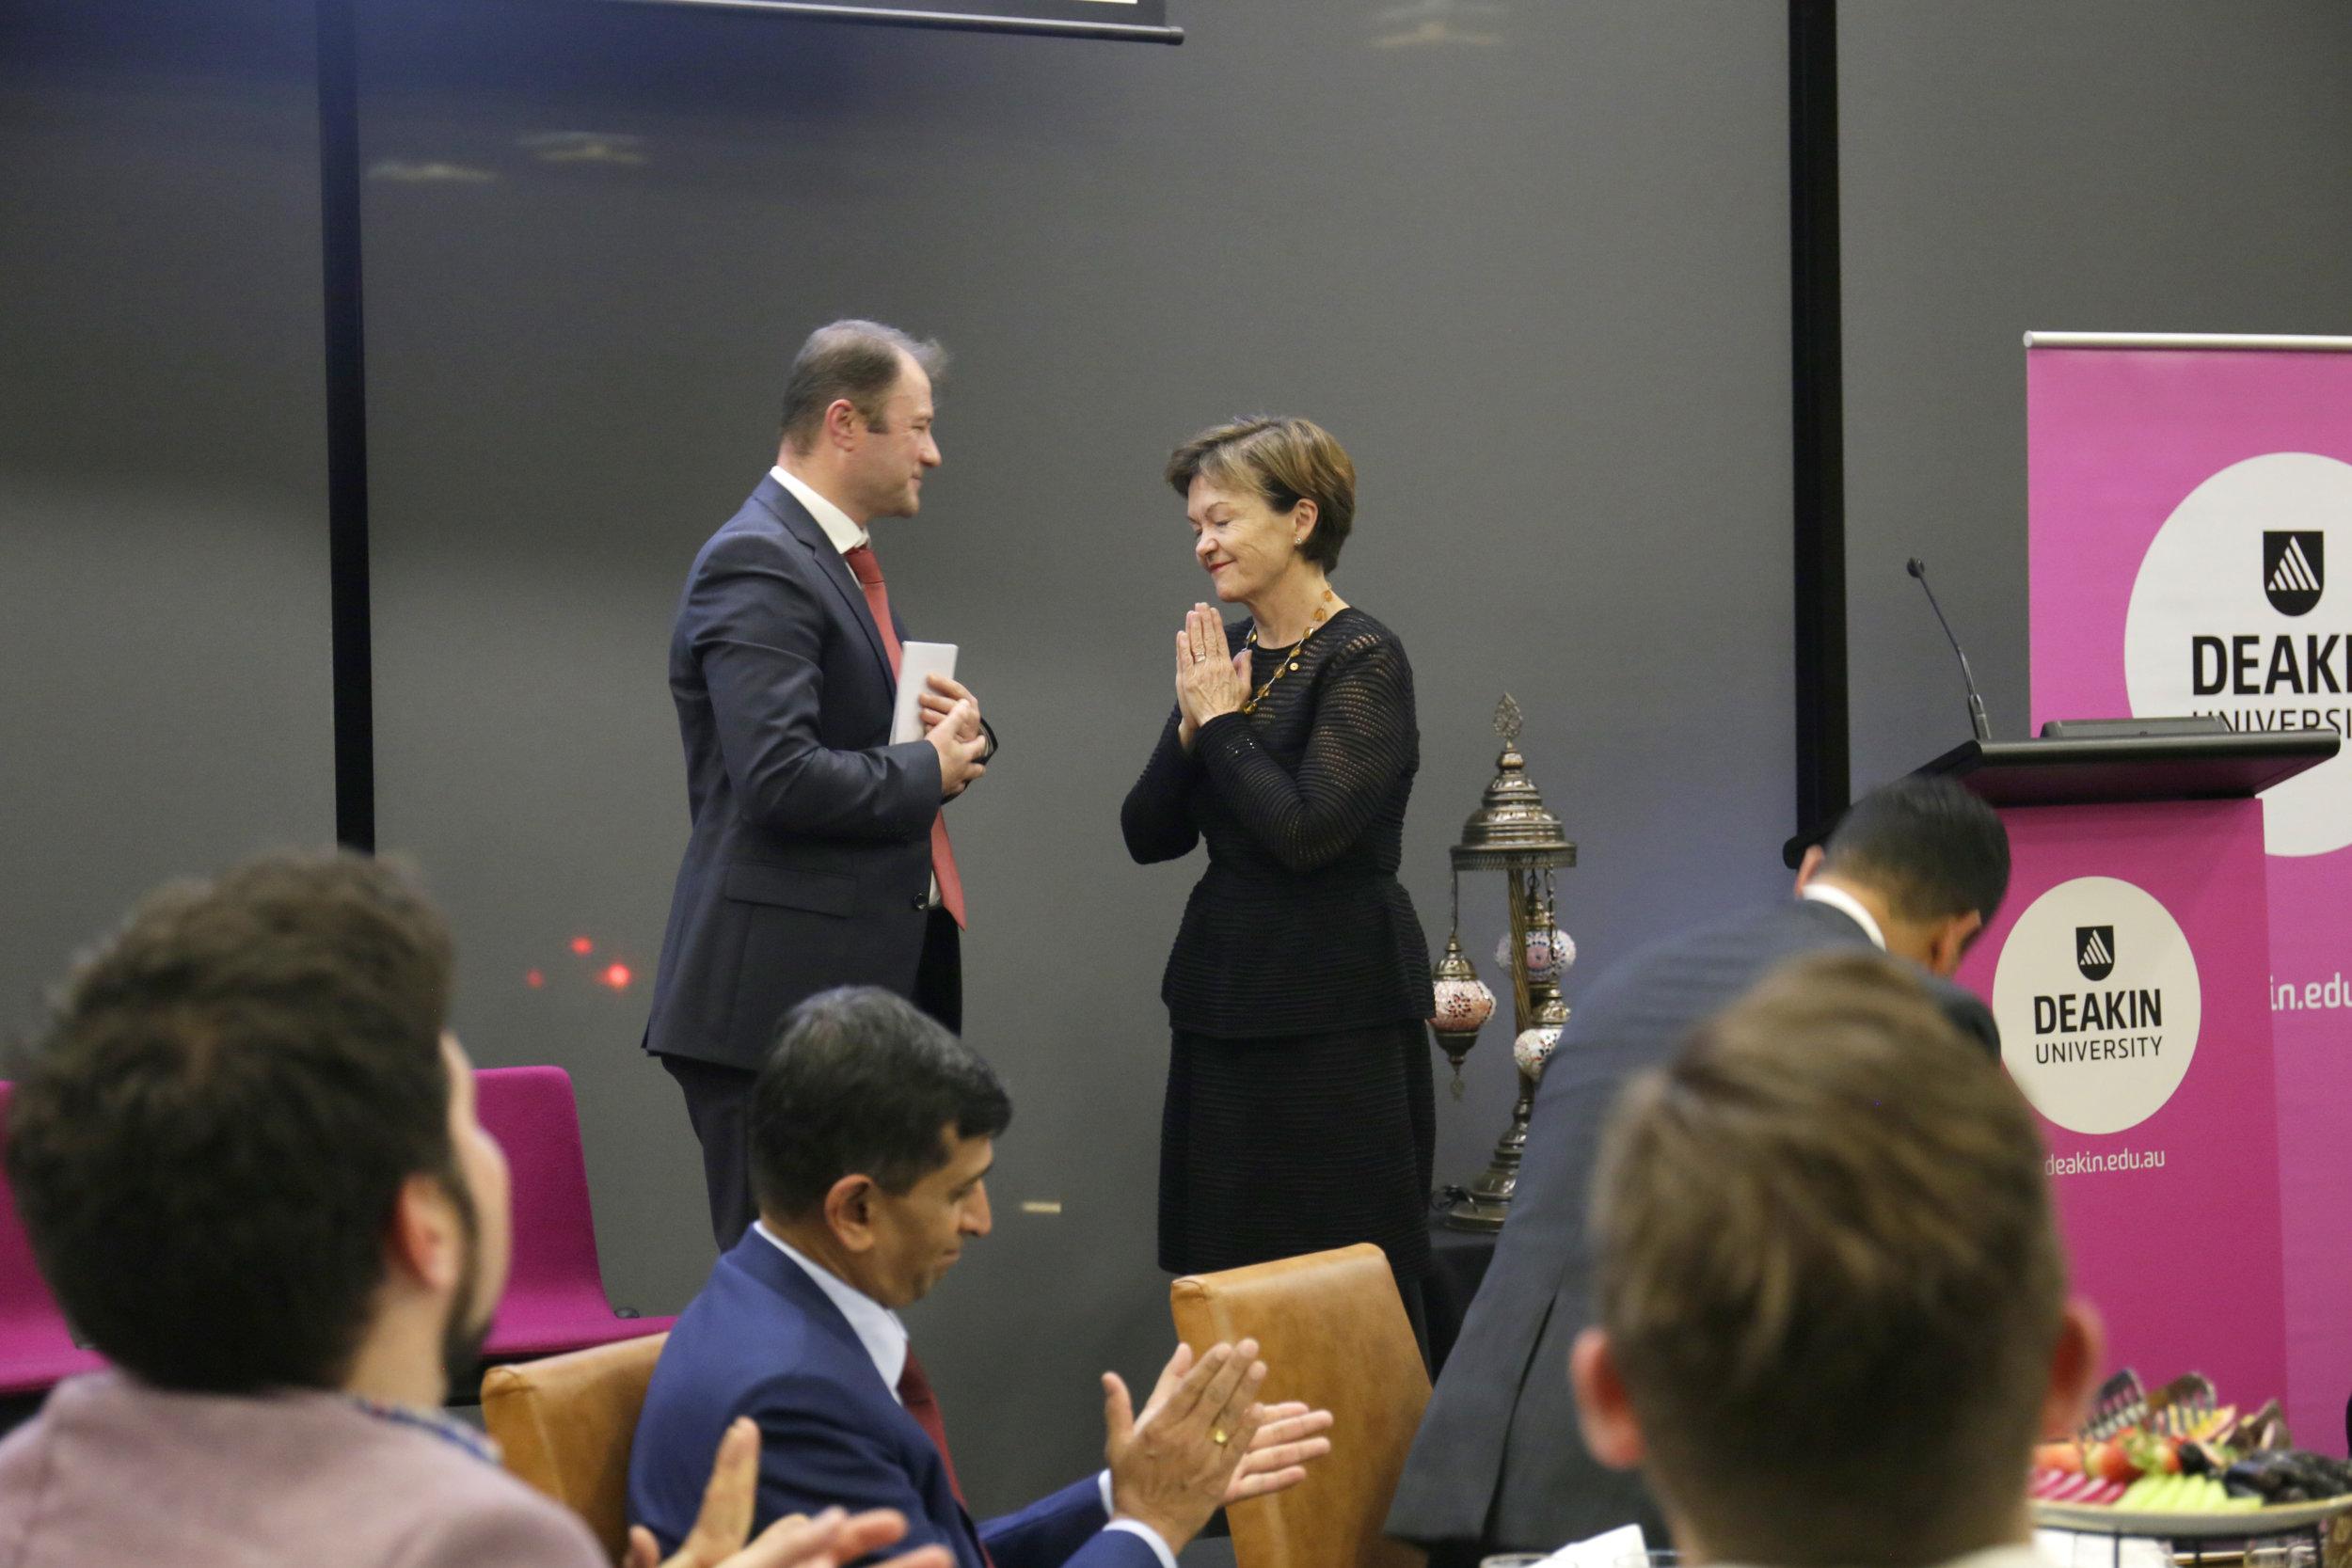 Mr Ahmet Keskin and Professor Jane den Hollander